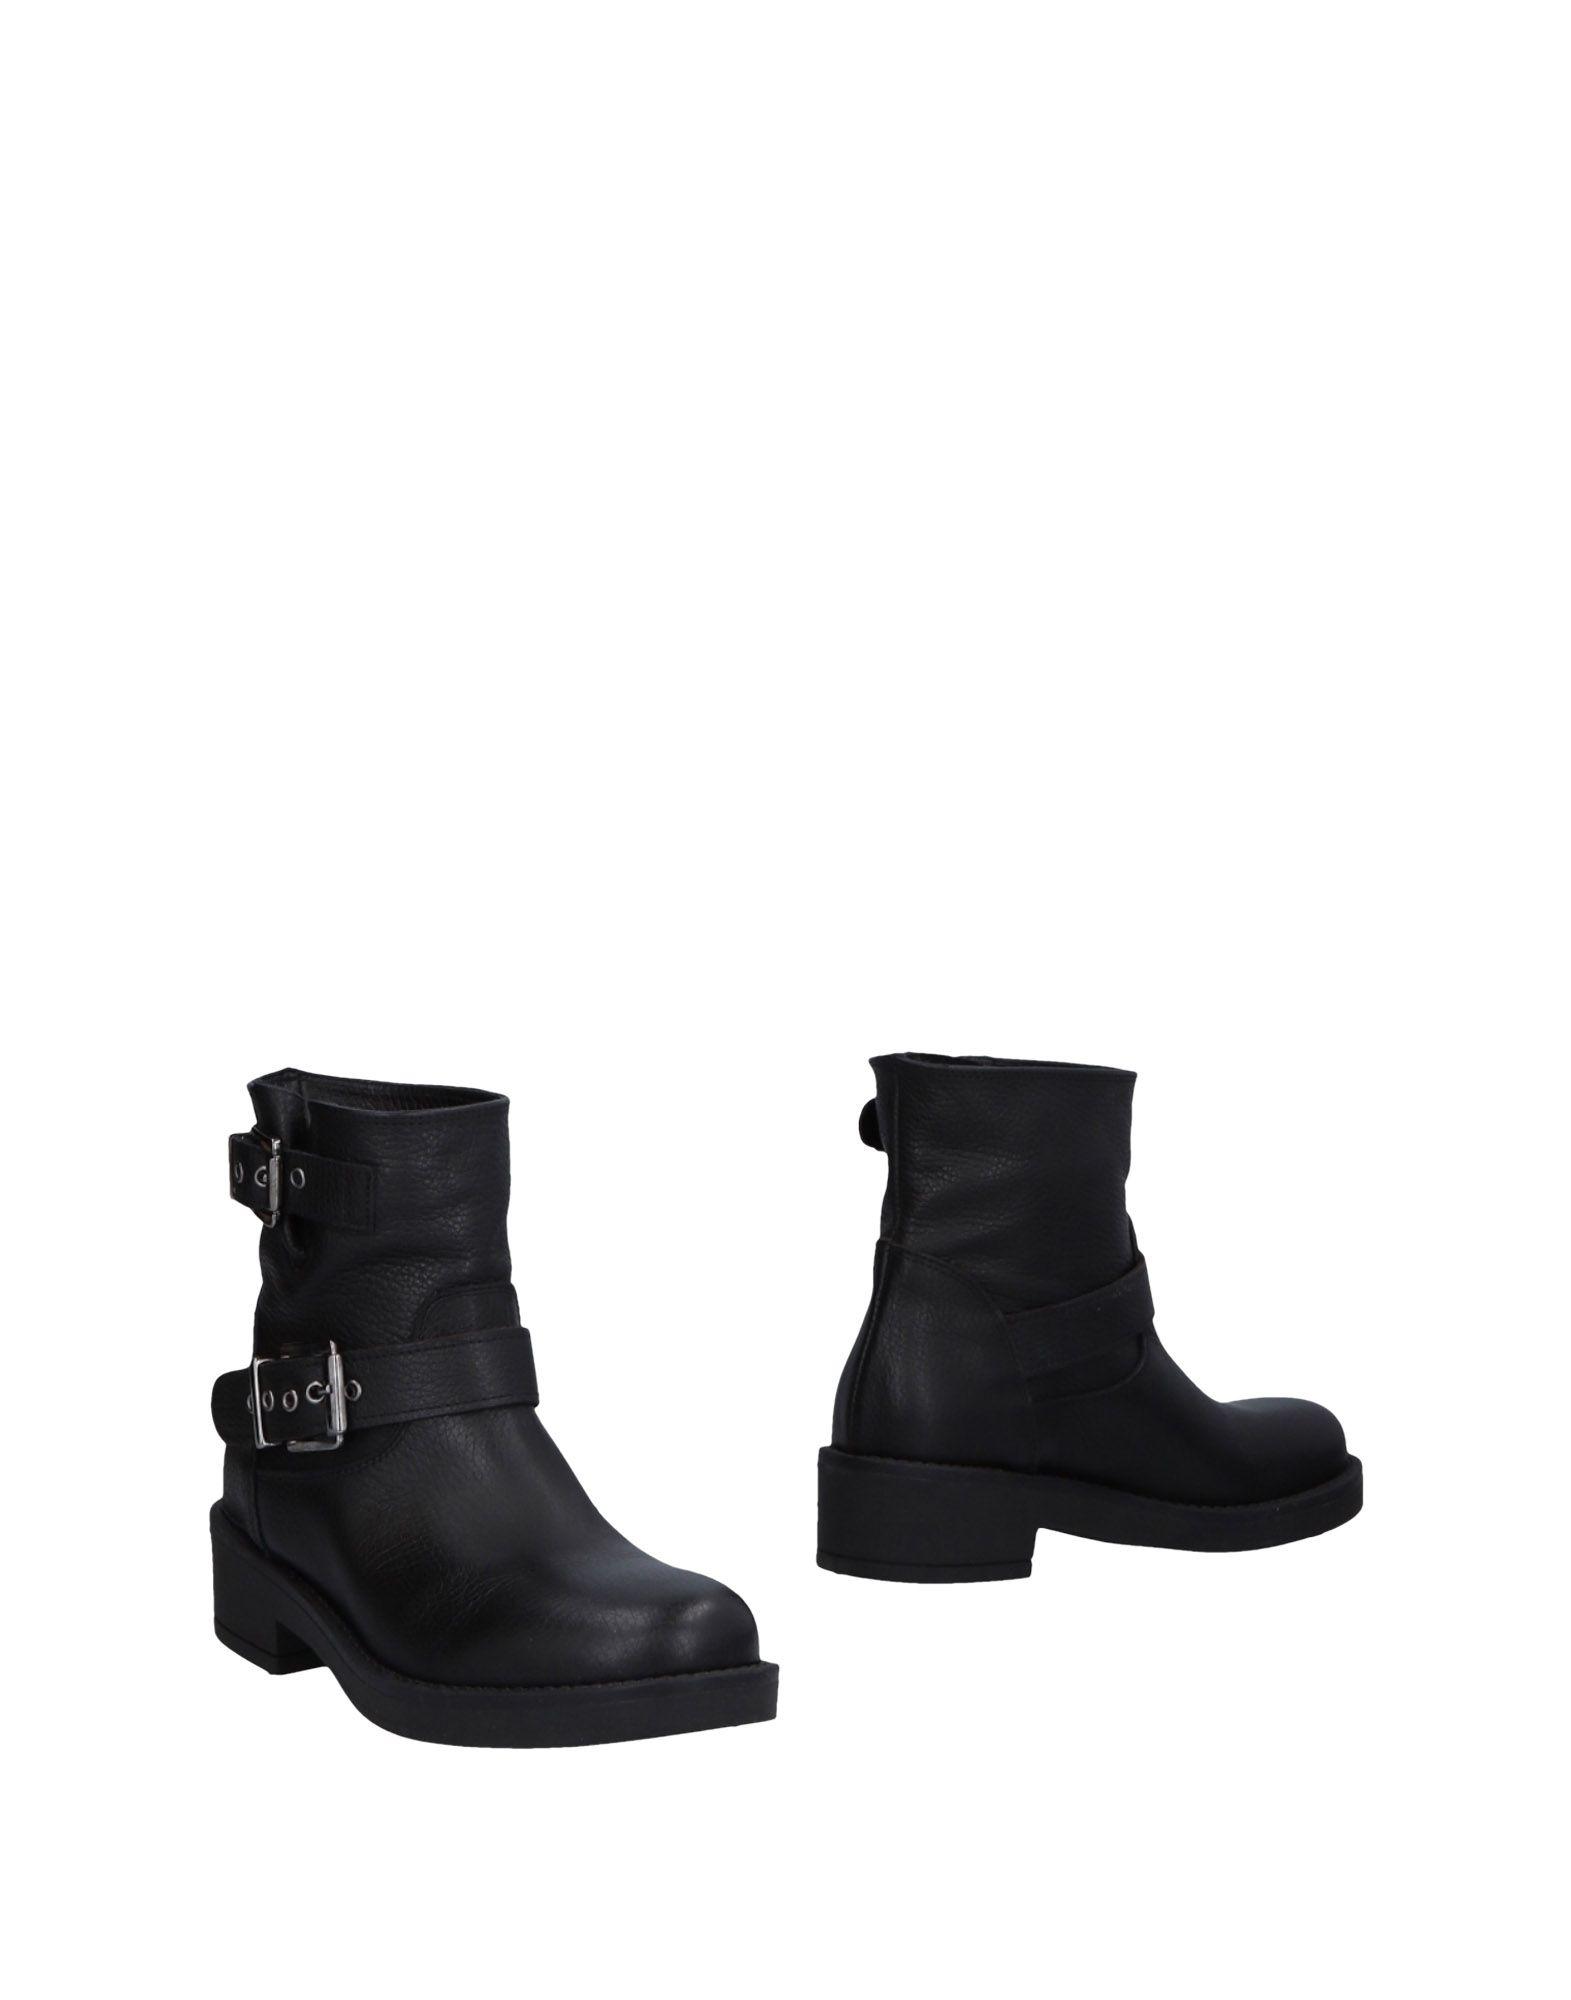 Unlace 11475038MO Stiefelette Damen  11475038MO Unlace Gute Qualität beliebte Schuhe 6931f1